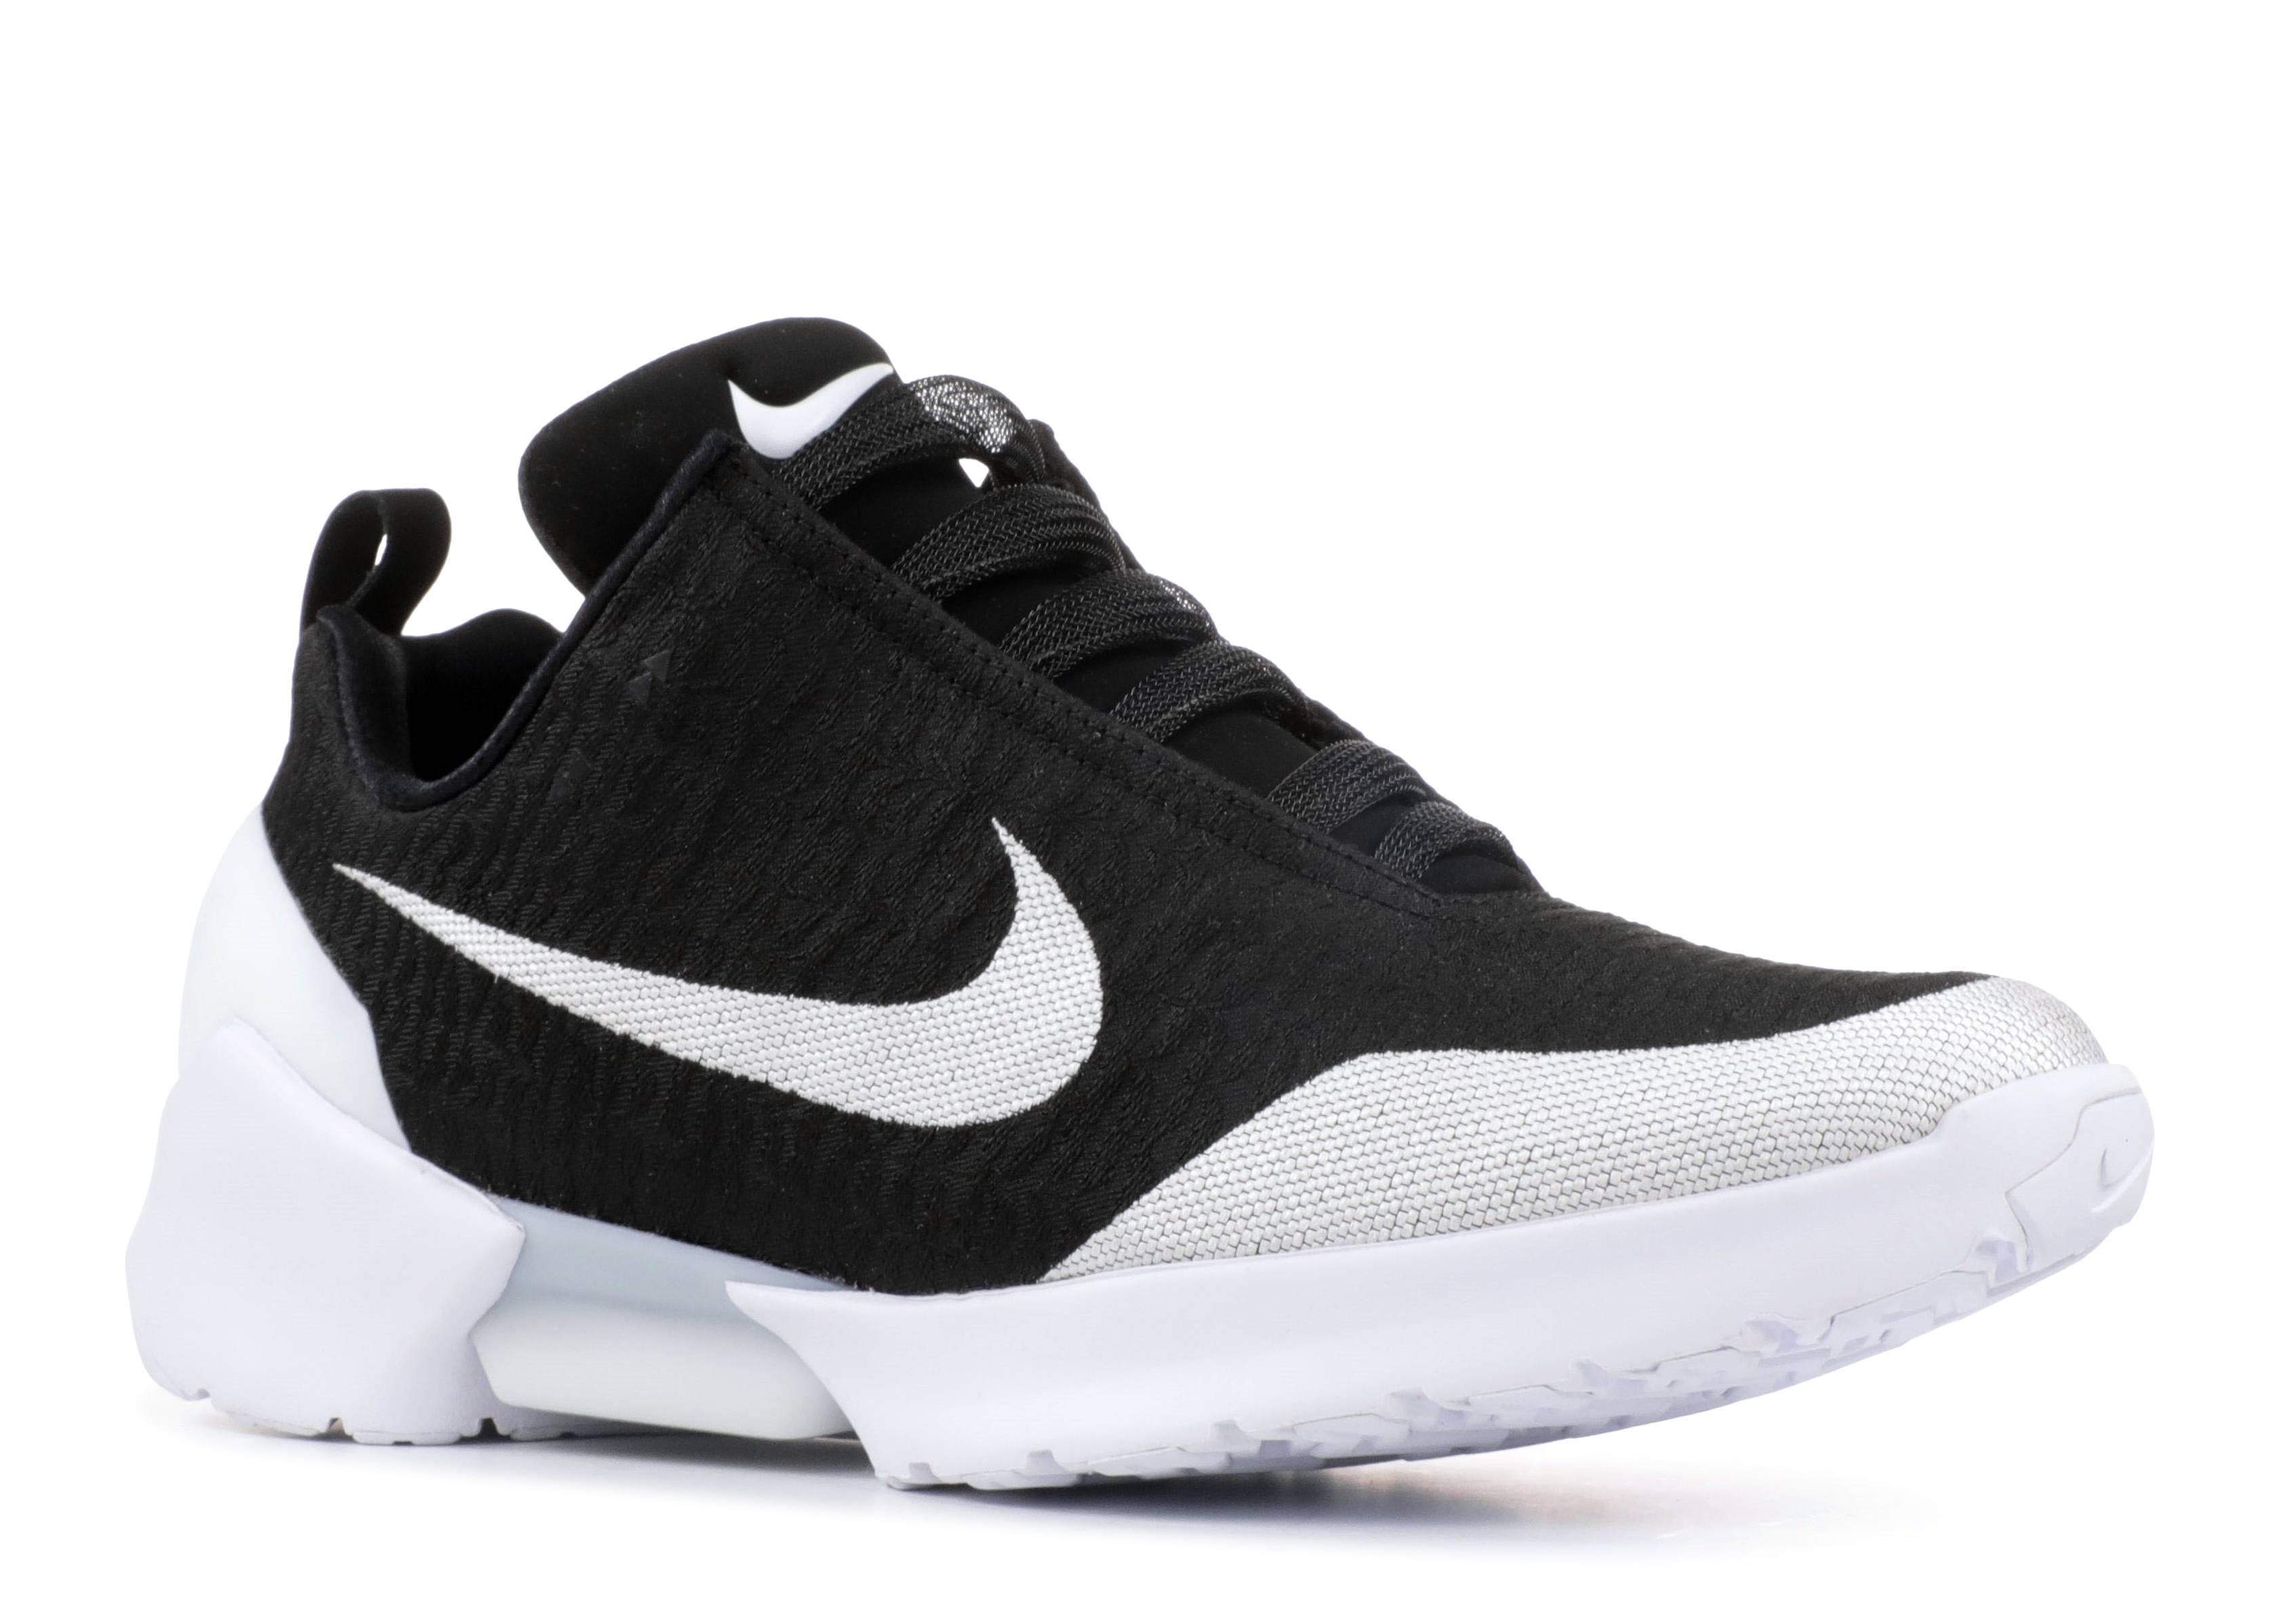 Nike Hyper Adapt 1.0 - Nike - 843871 011 - black white  0de809535